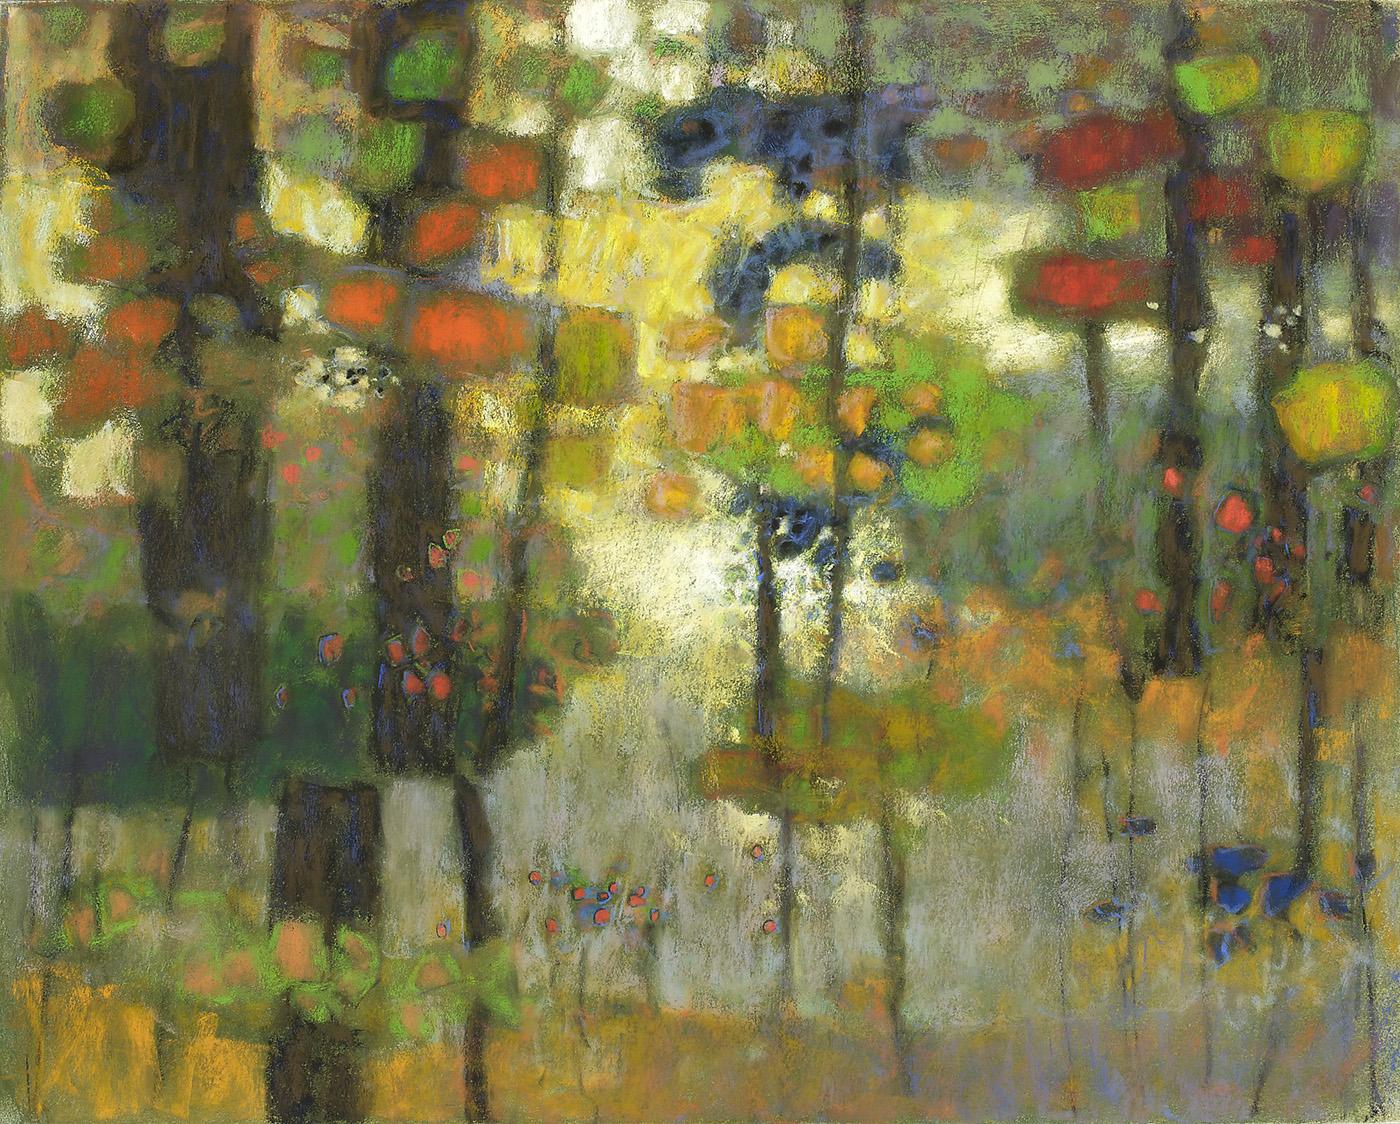 "Where Spirits Dwell   | pastel on paper | 24 x 30"" | 2010"